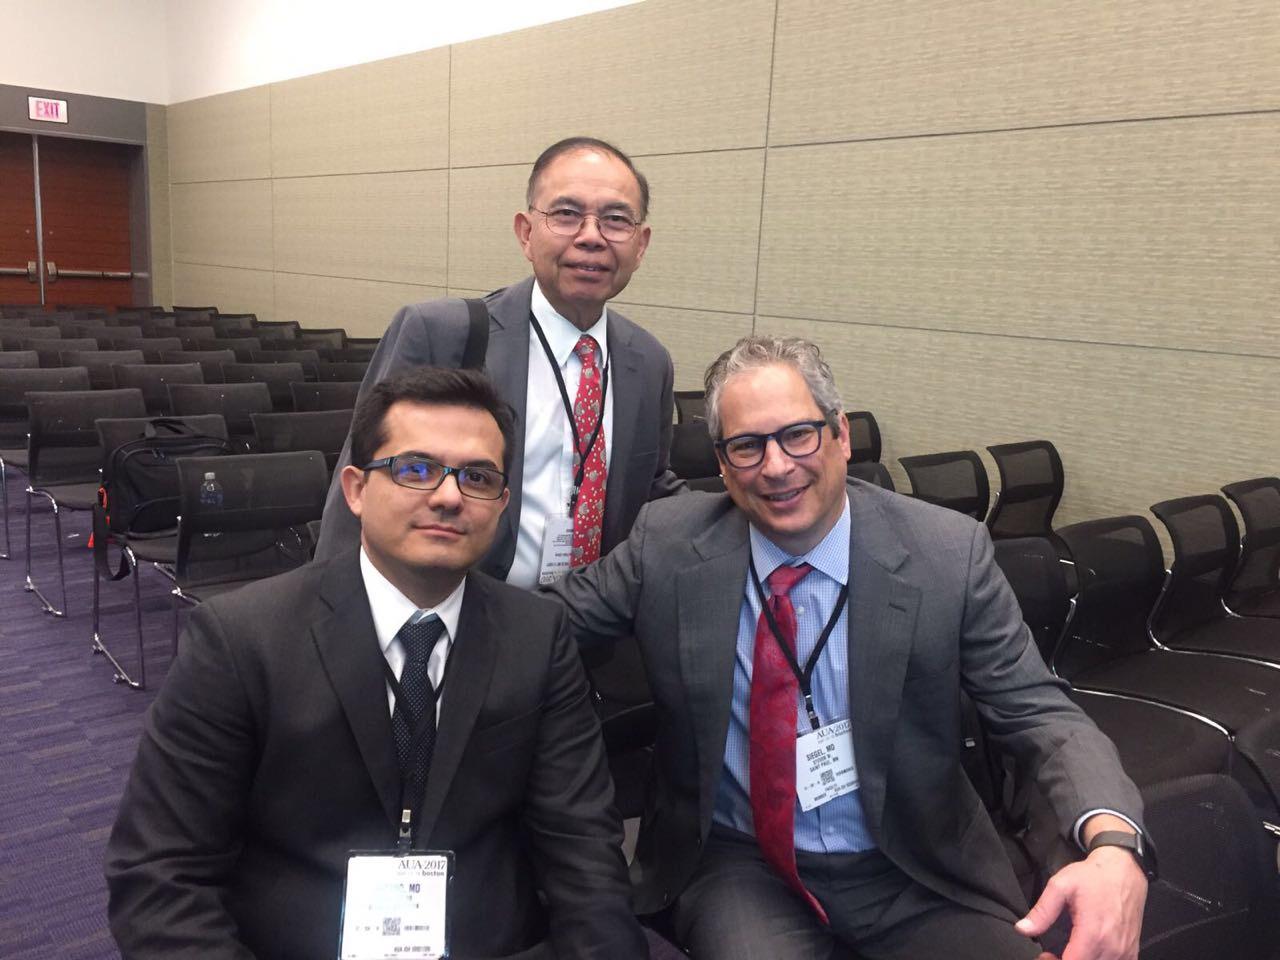 American Urology Association annual meeting. Boston .EEUU. 2017